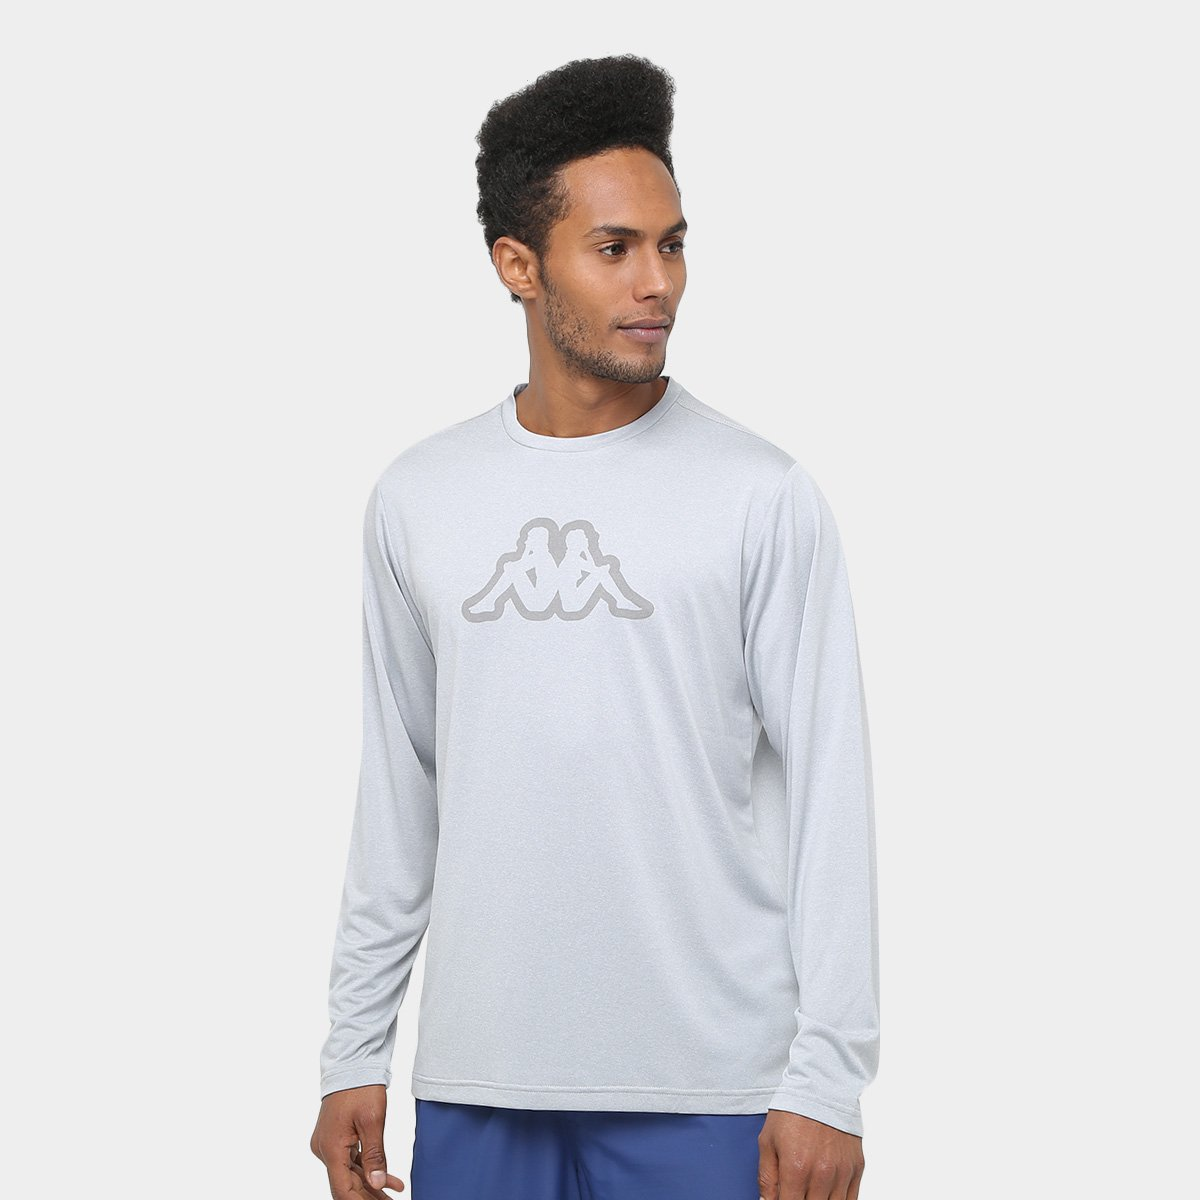 Camiseta Kappa Nassiri Manga Longa Masculina - Compre Agora ... 5c6619dc58f77